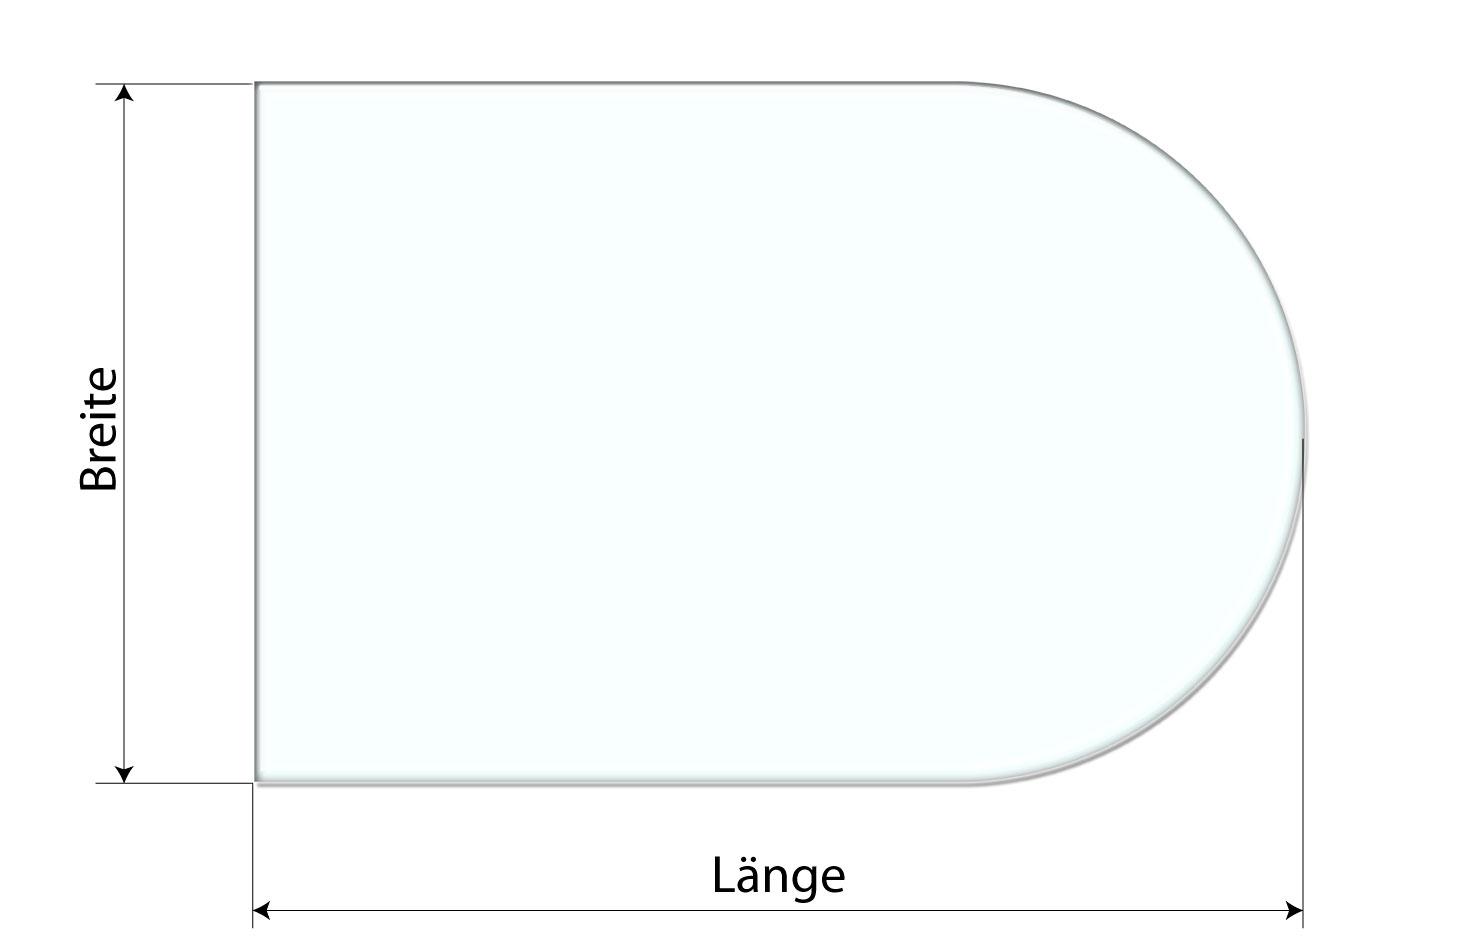 funkenschutzplatte aus esg glas f r den kamin esg glas. Black Bedroom Furniture Sets. Home Design Ideas